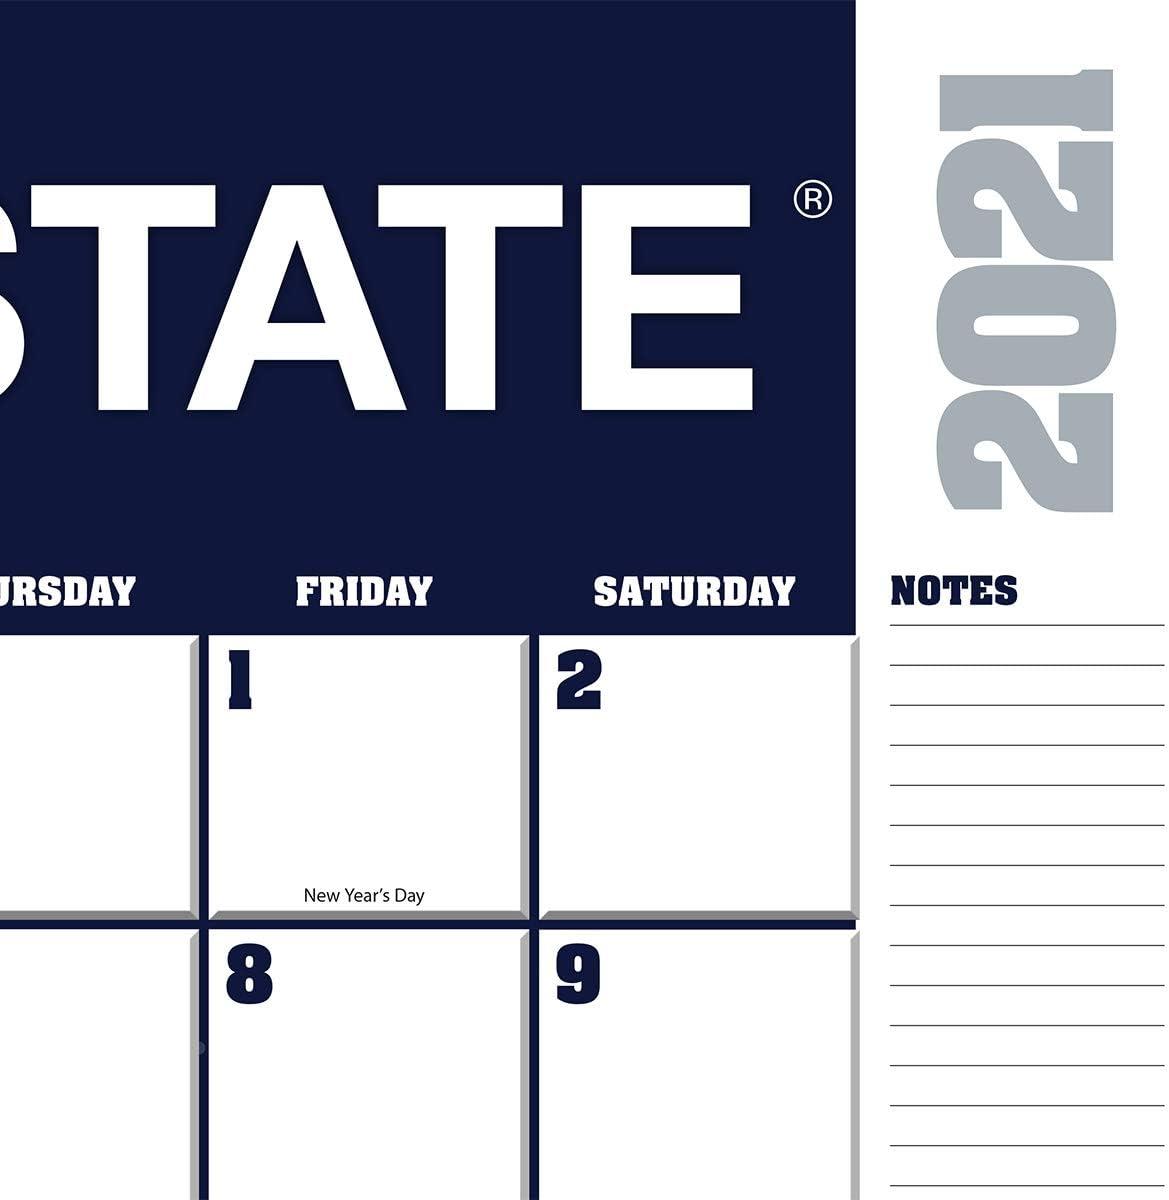 Psu Academic Calendar 2022.Calendar 2021 Penn State Calendar 2021 22